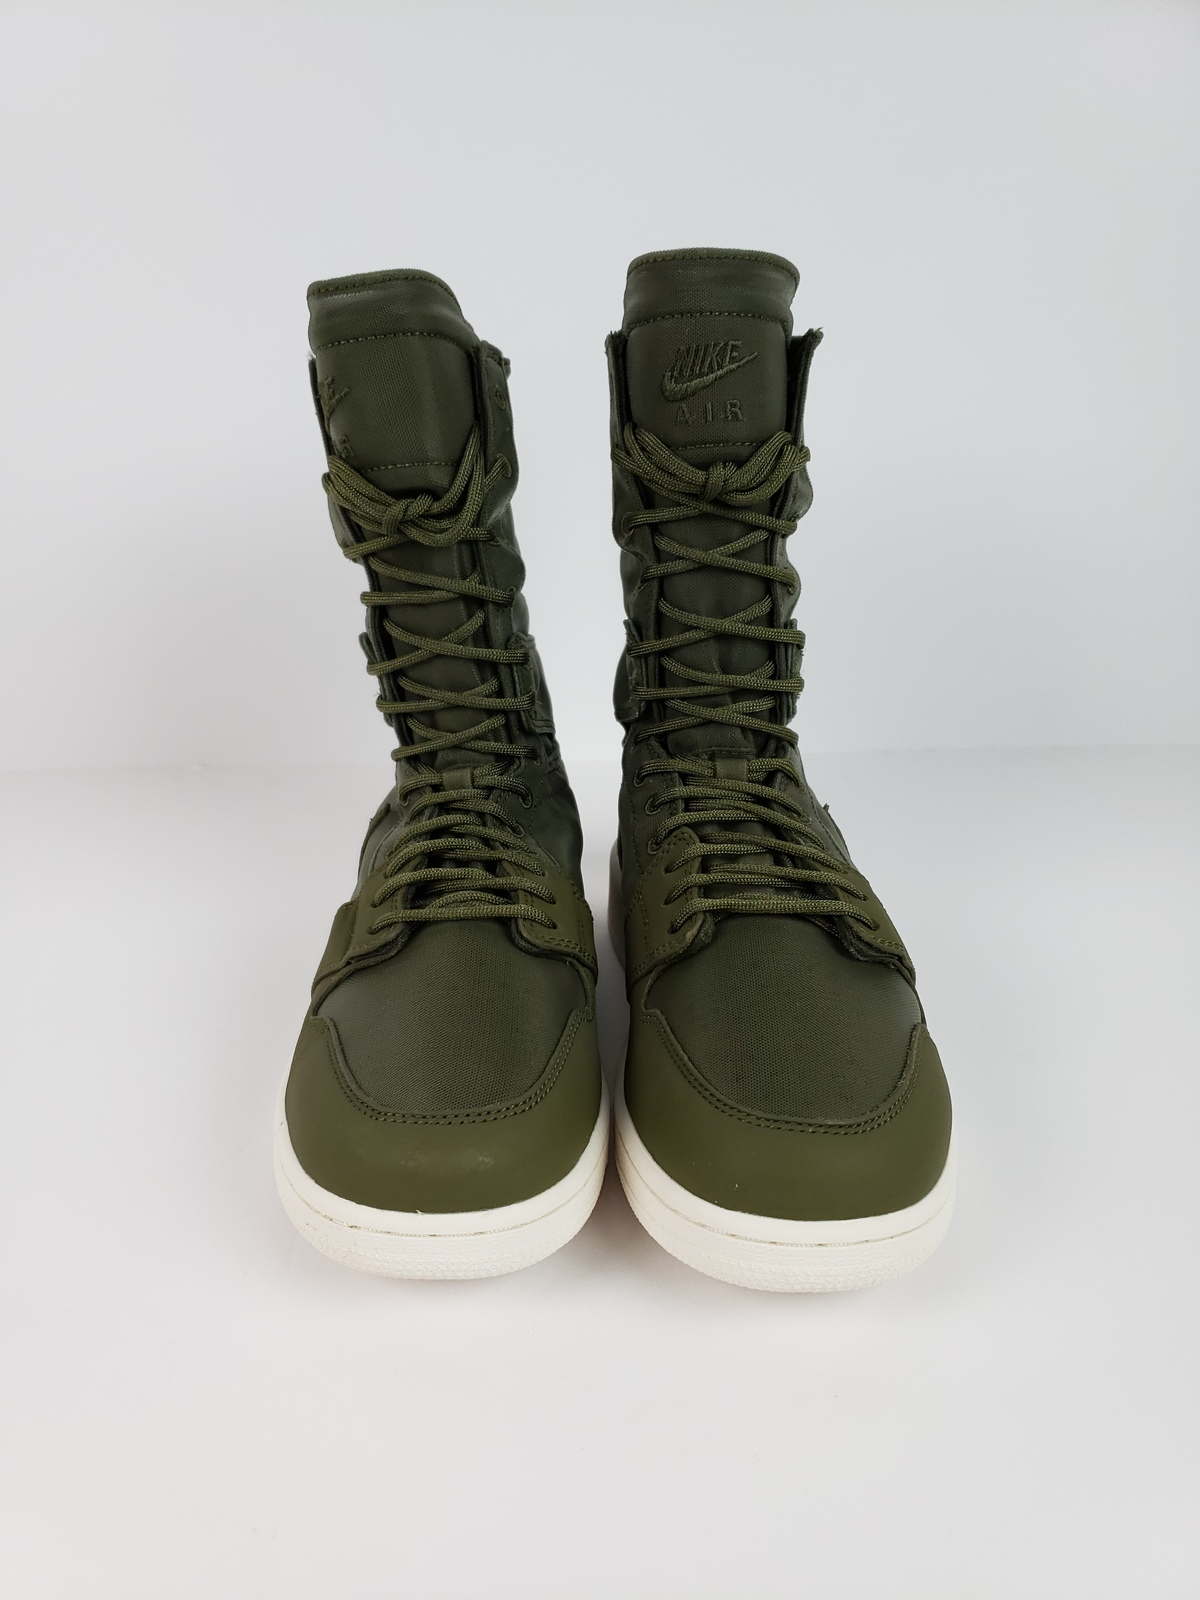 527325591a4 Nike Air Jordan 1 Explorer XX Phantom Boots and 23 similar items